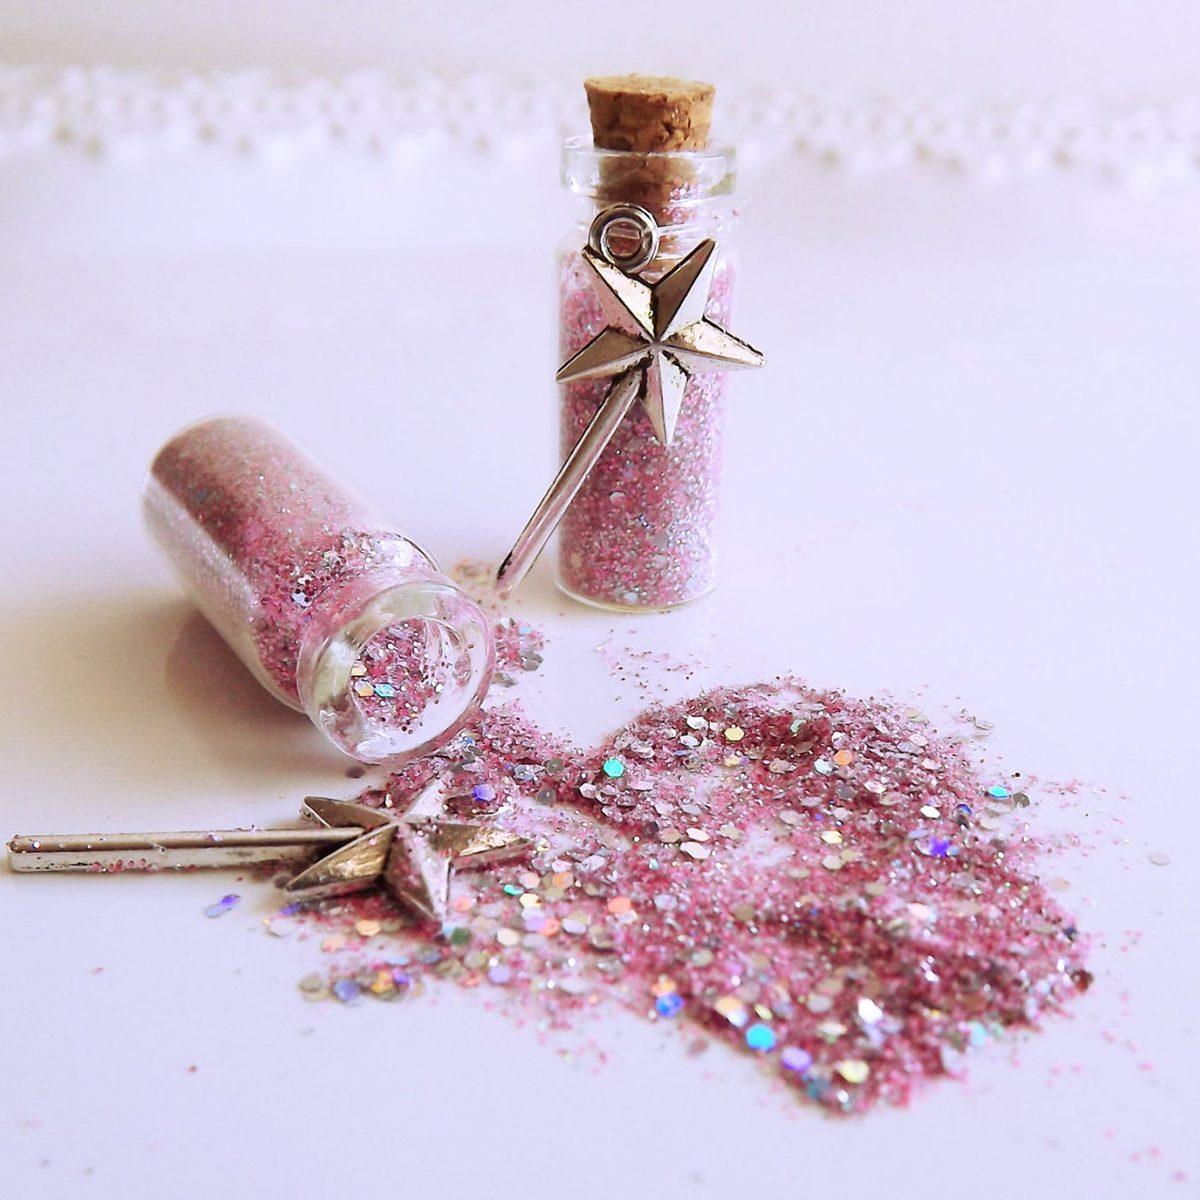 Fairy Wish Favors|Pink Party Favors|Princess Party Favors|Pixie Dust|Faerie Sprinkles|Set of 10